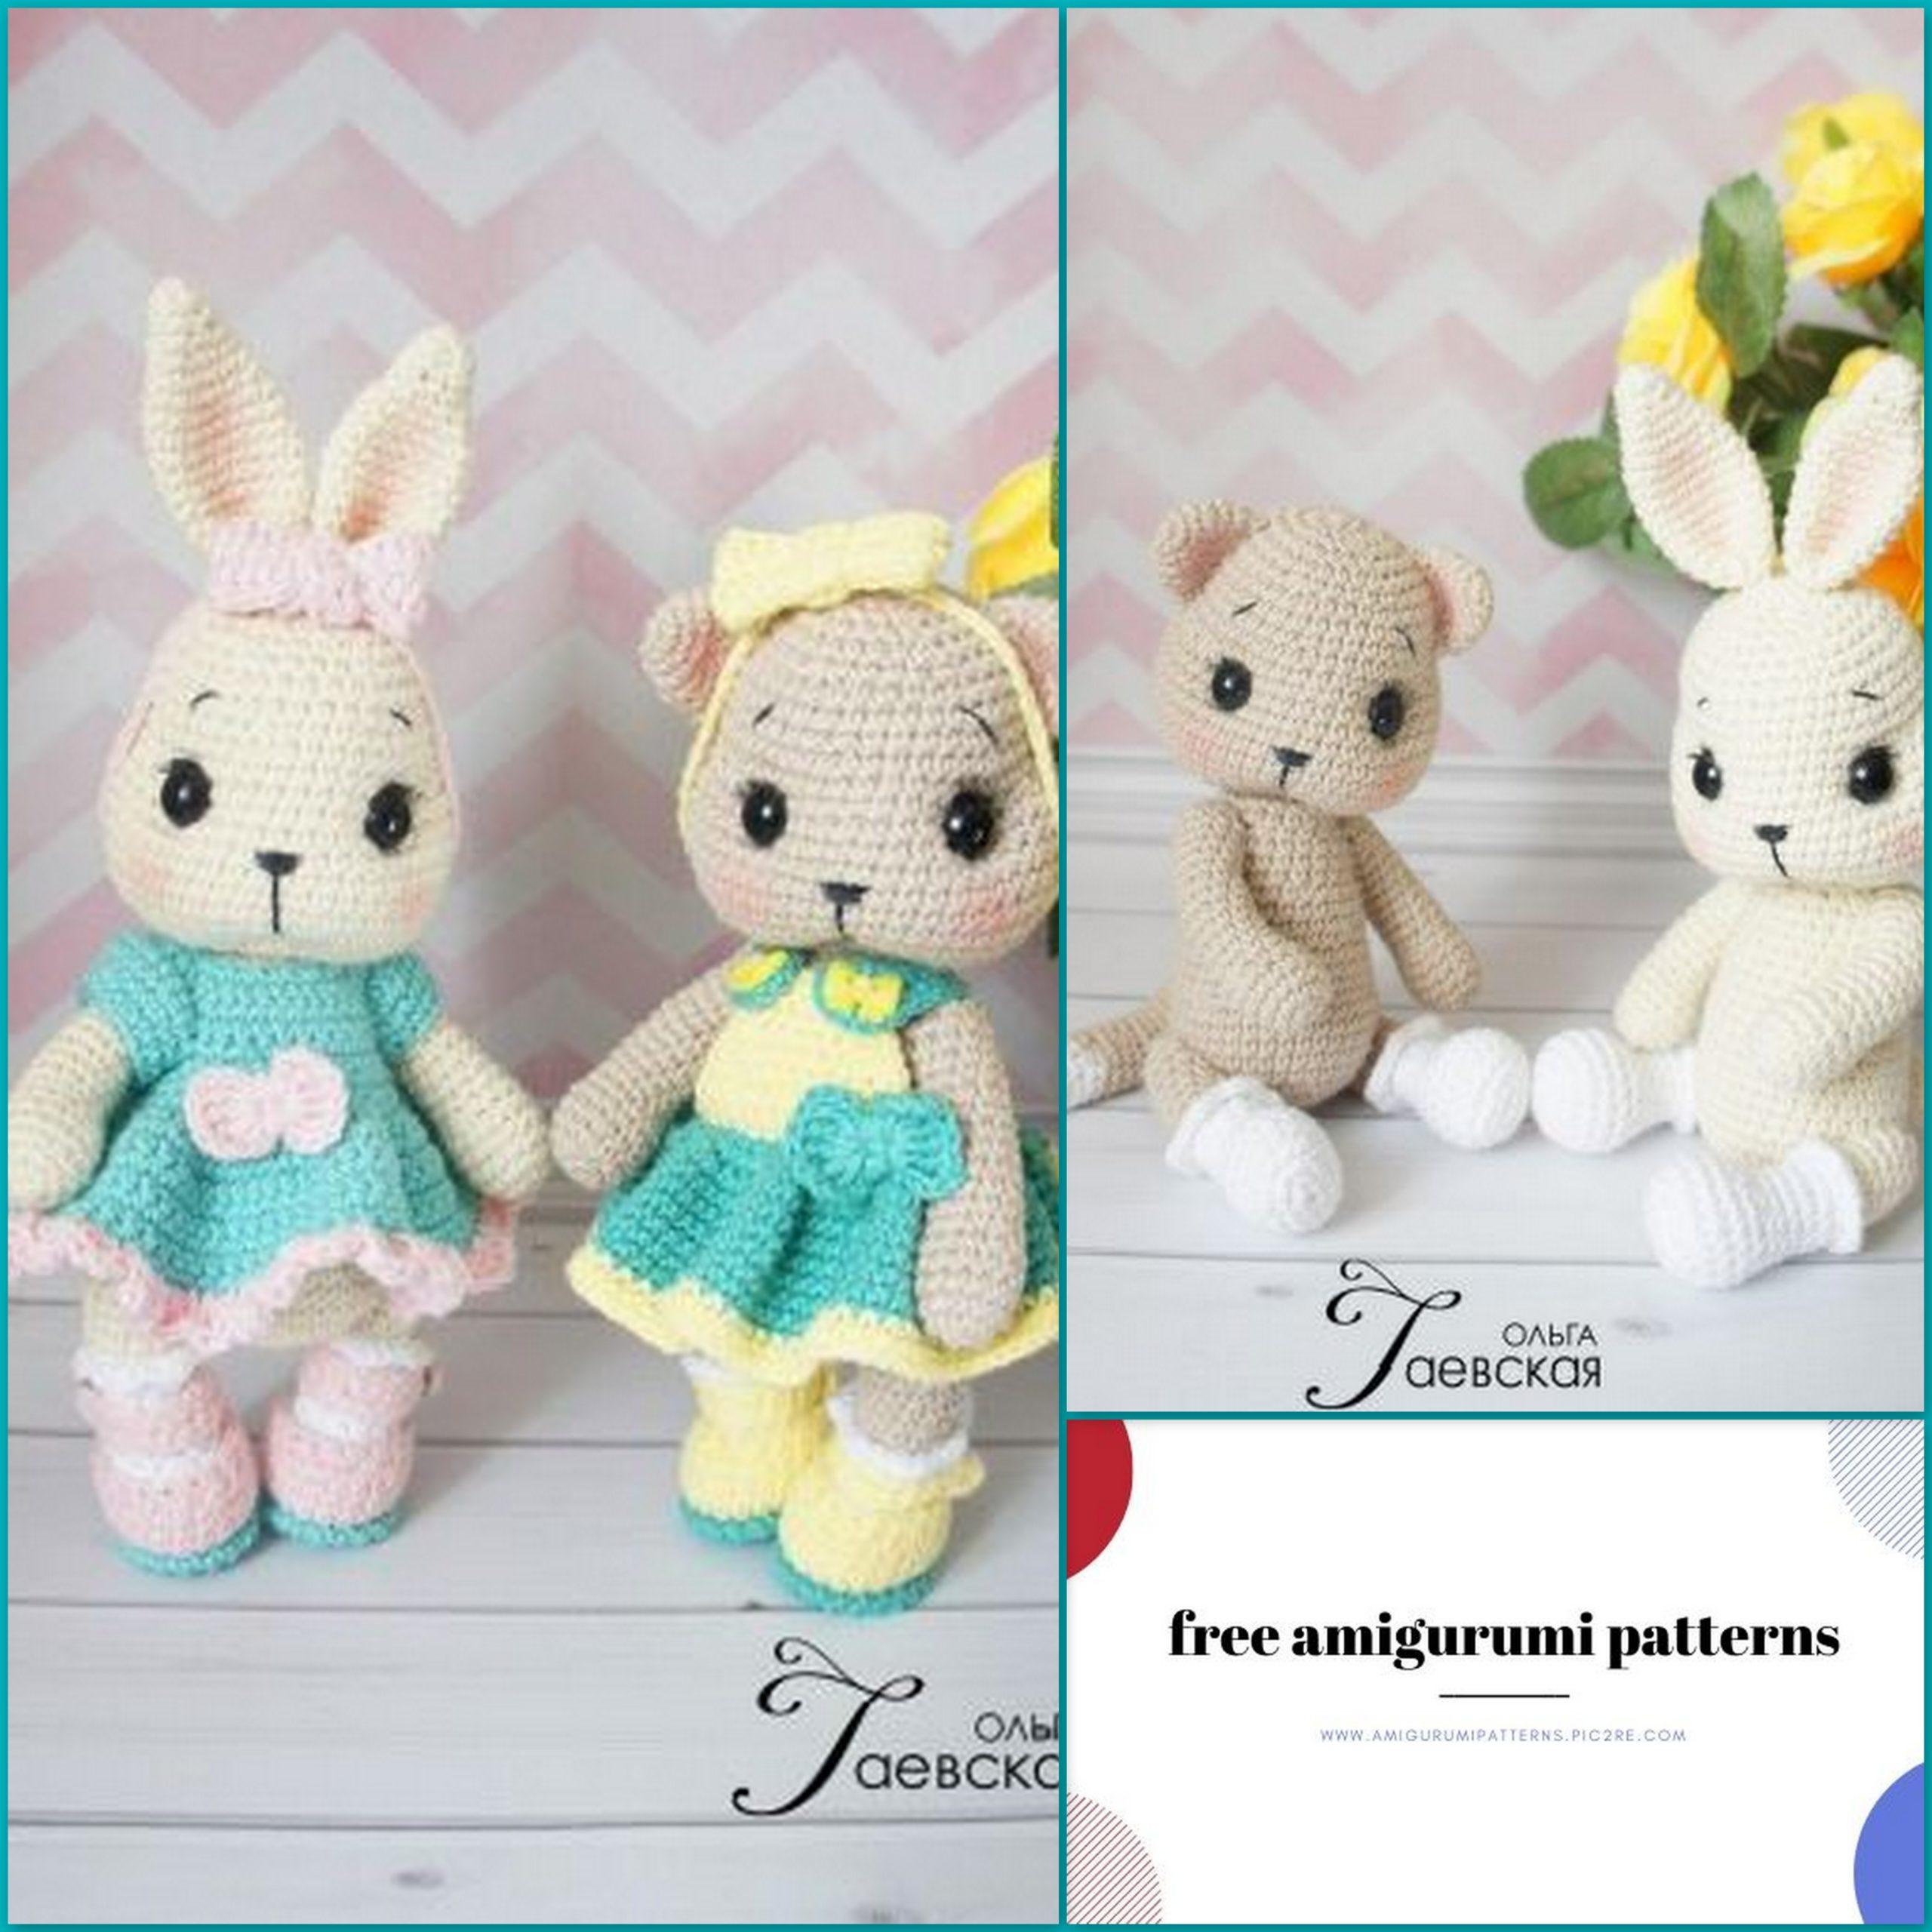 Amigurumi Bunny Free Crochet Patterns - Page 2 of 2 - Crochet ... | 2560x2560